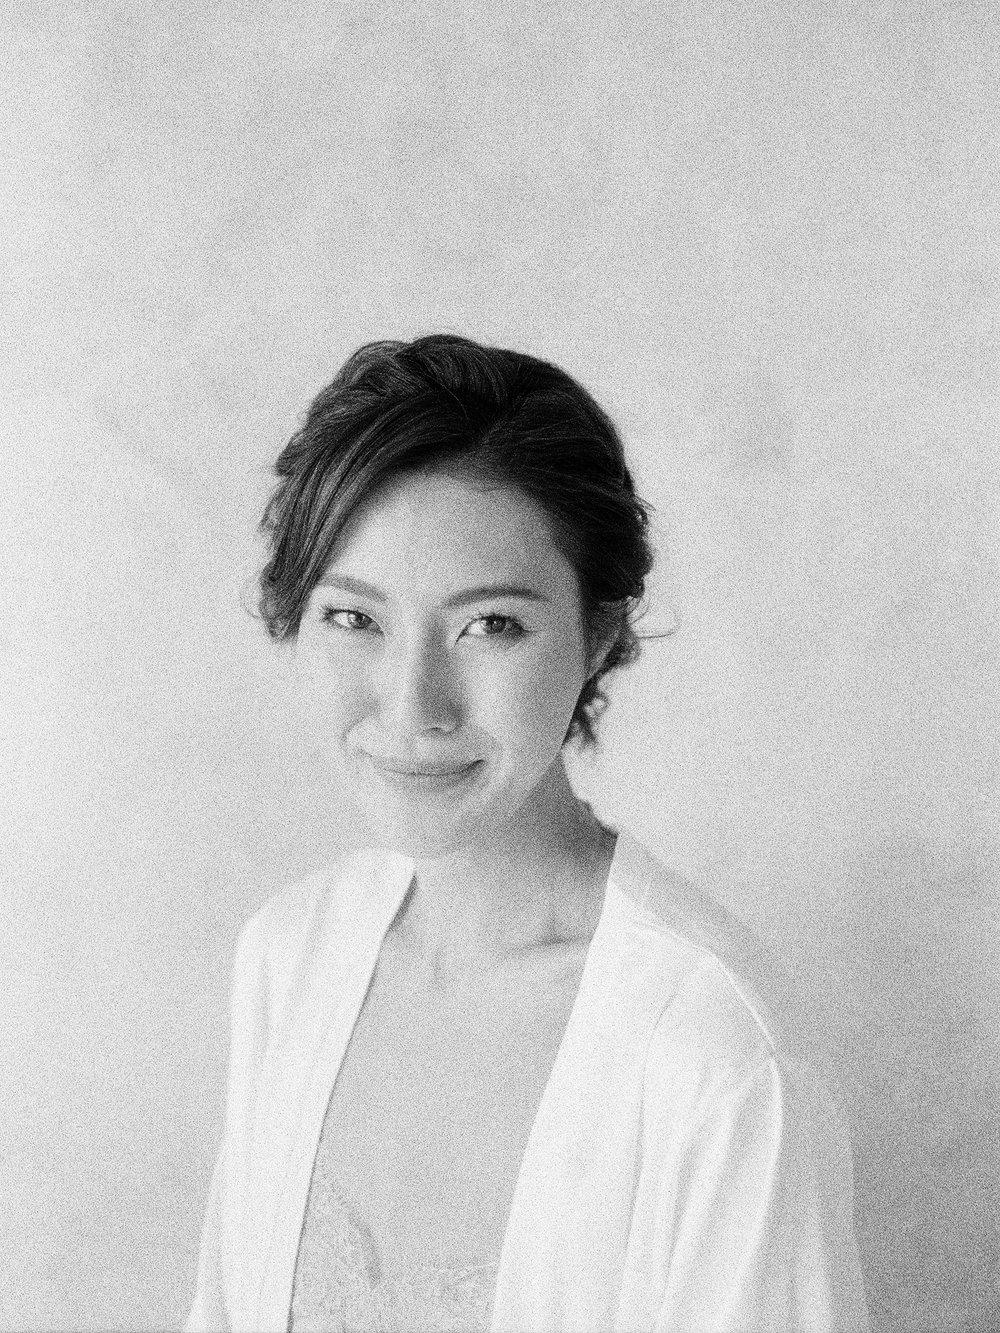 KS-Editorial-119-Jen-Huang-000008310020.jpg